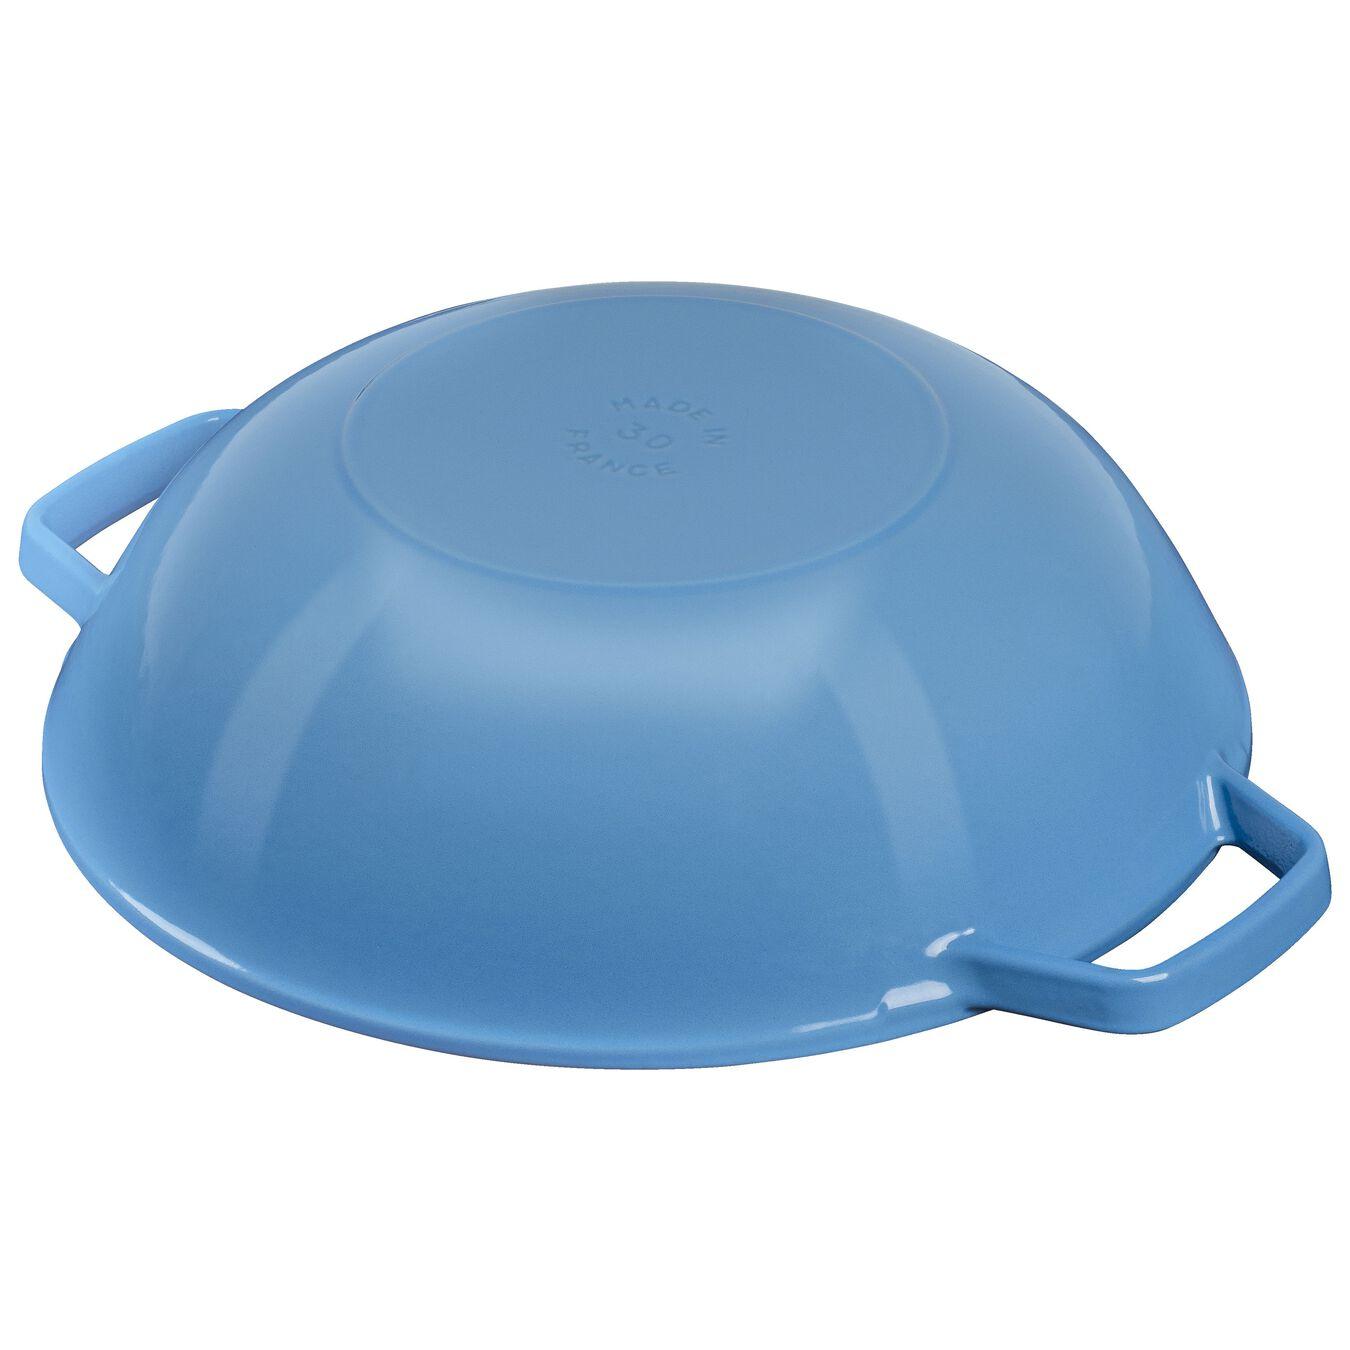 30 cm / 12 inch Cast iron Wok, ice-blue,,large 3